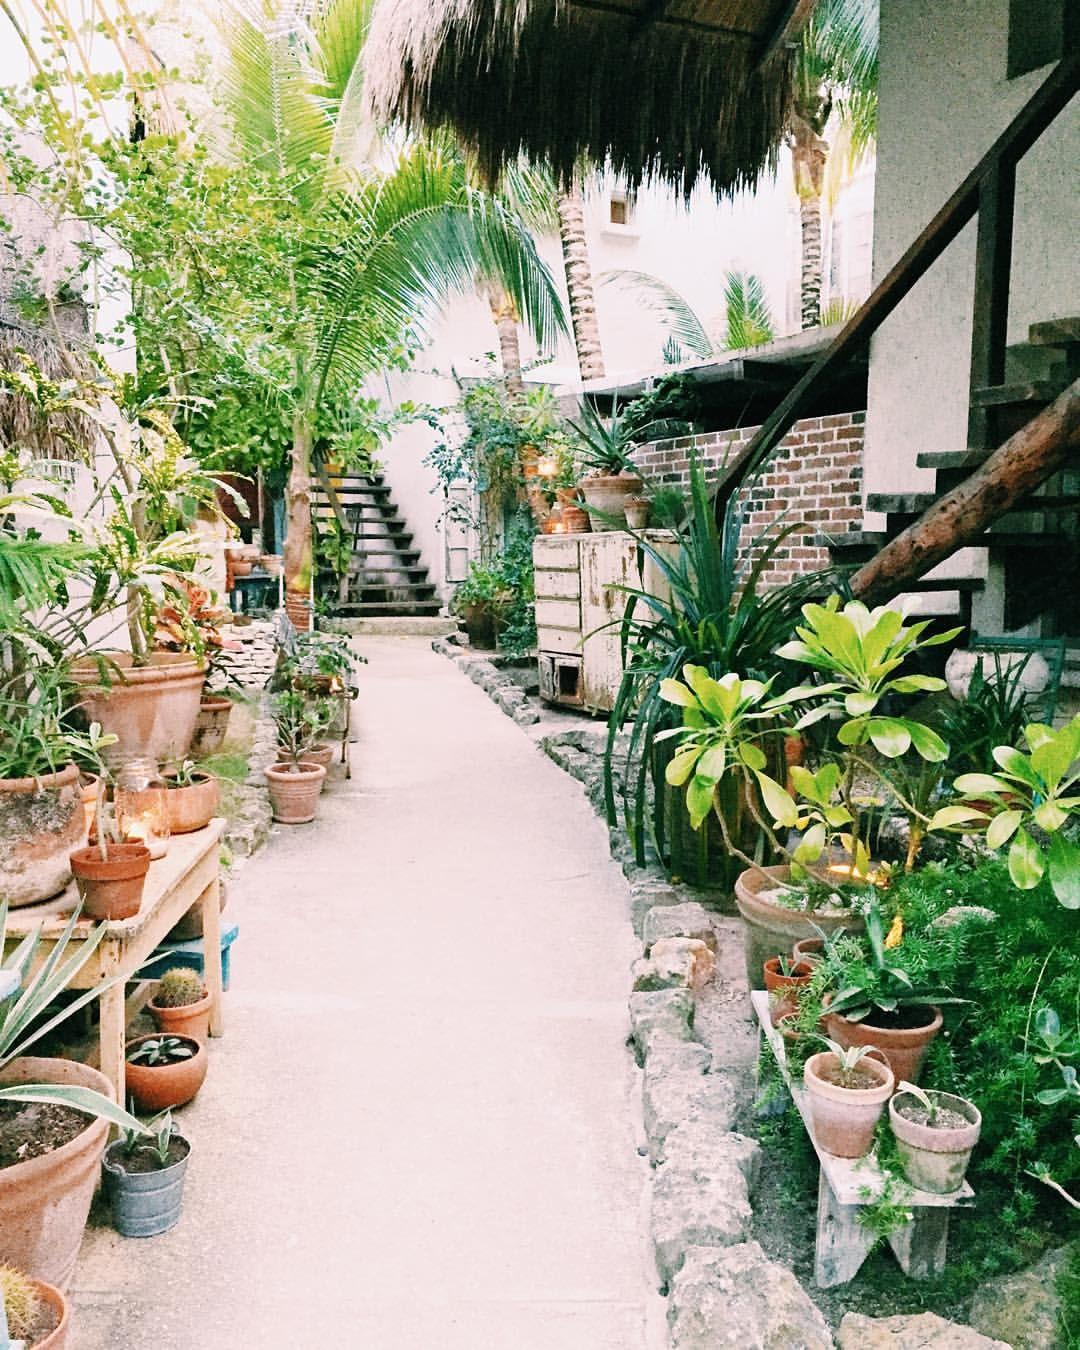 Pin by Sarah Aristizabal on Plants | Mediterranean garden ...